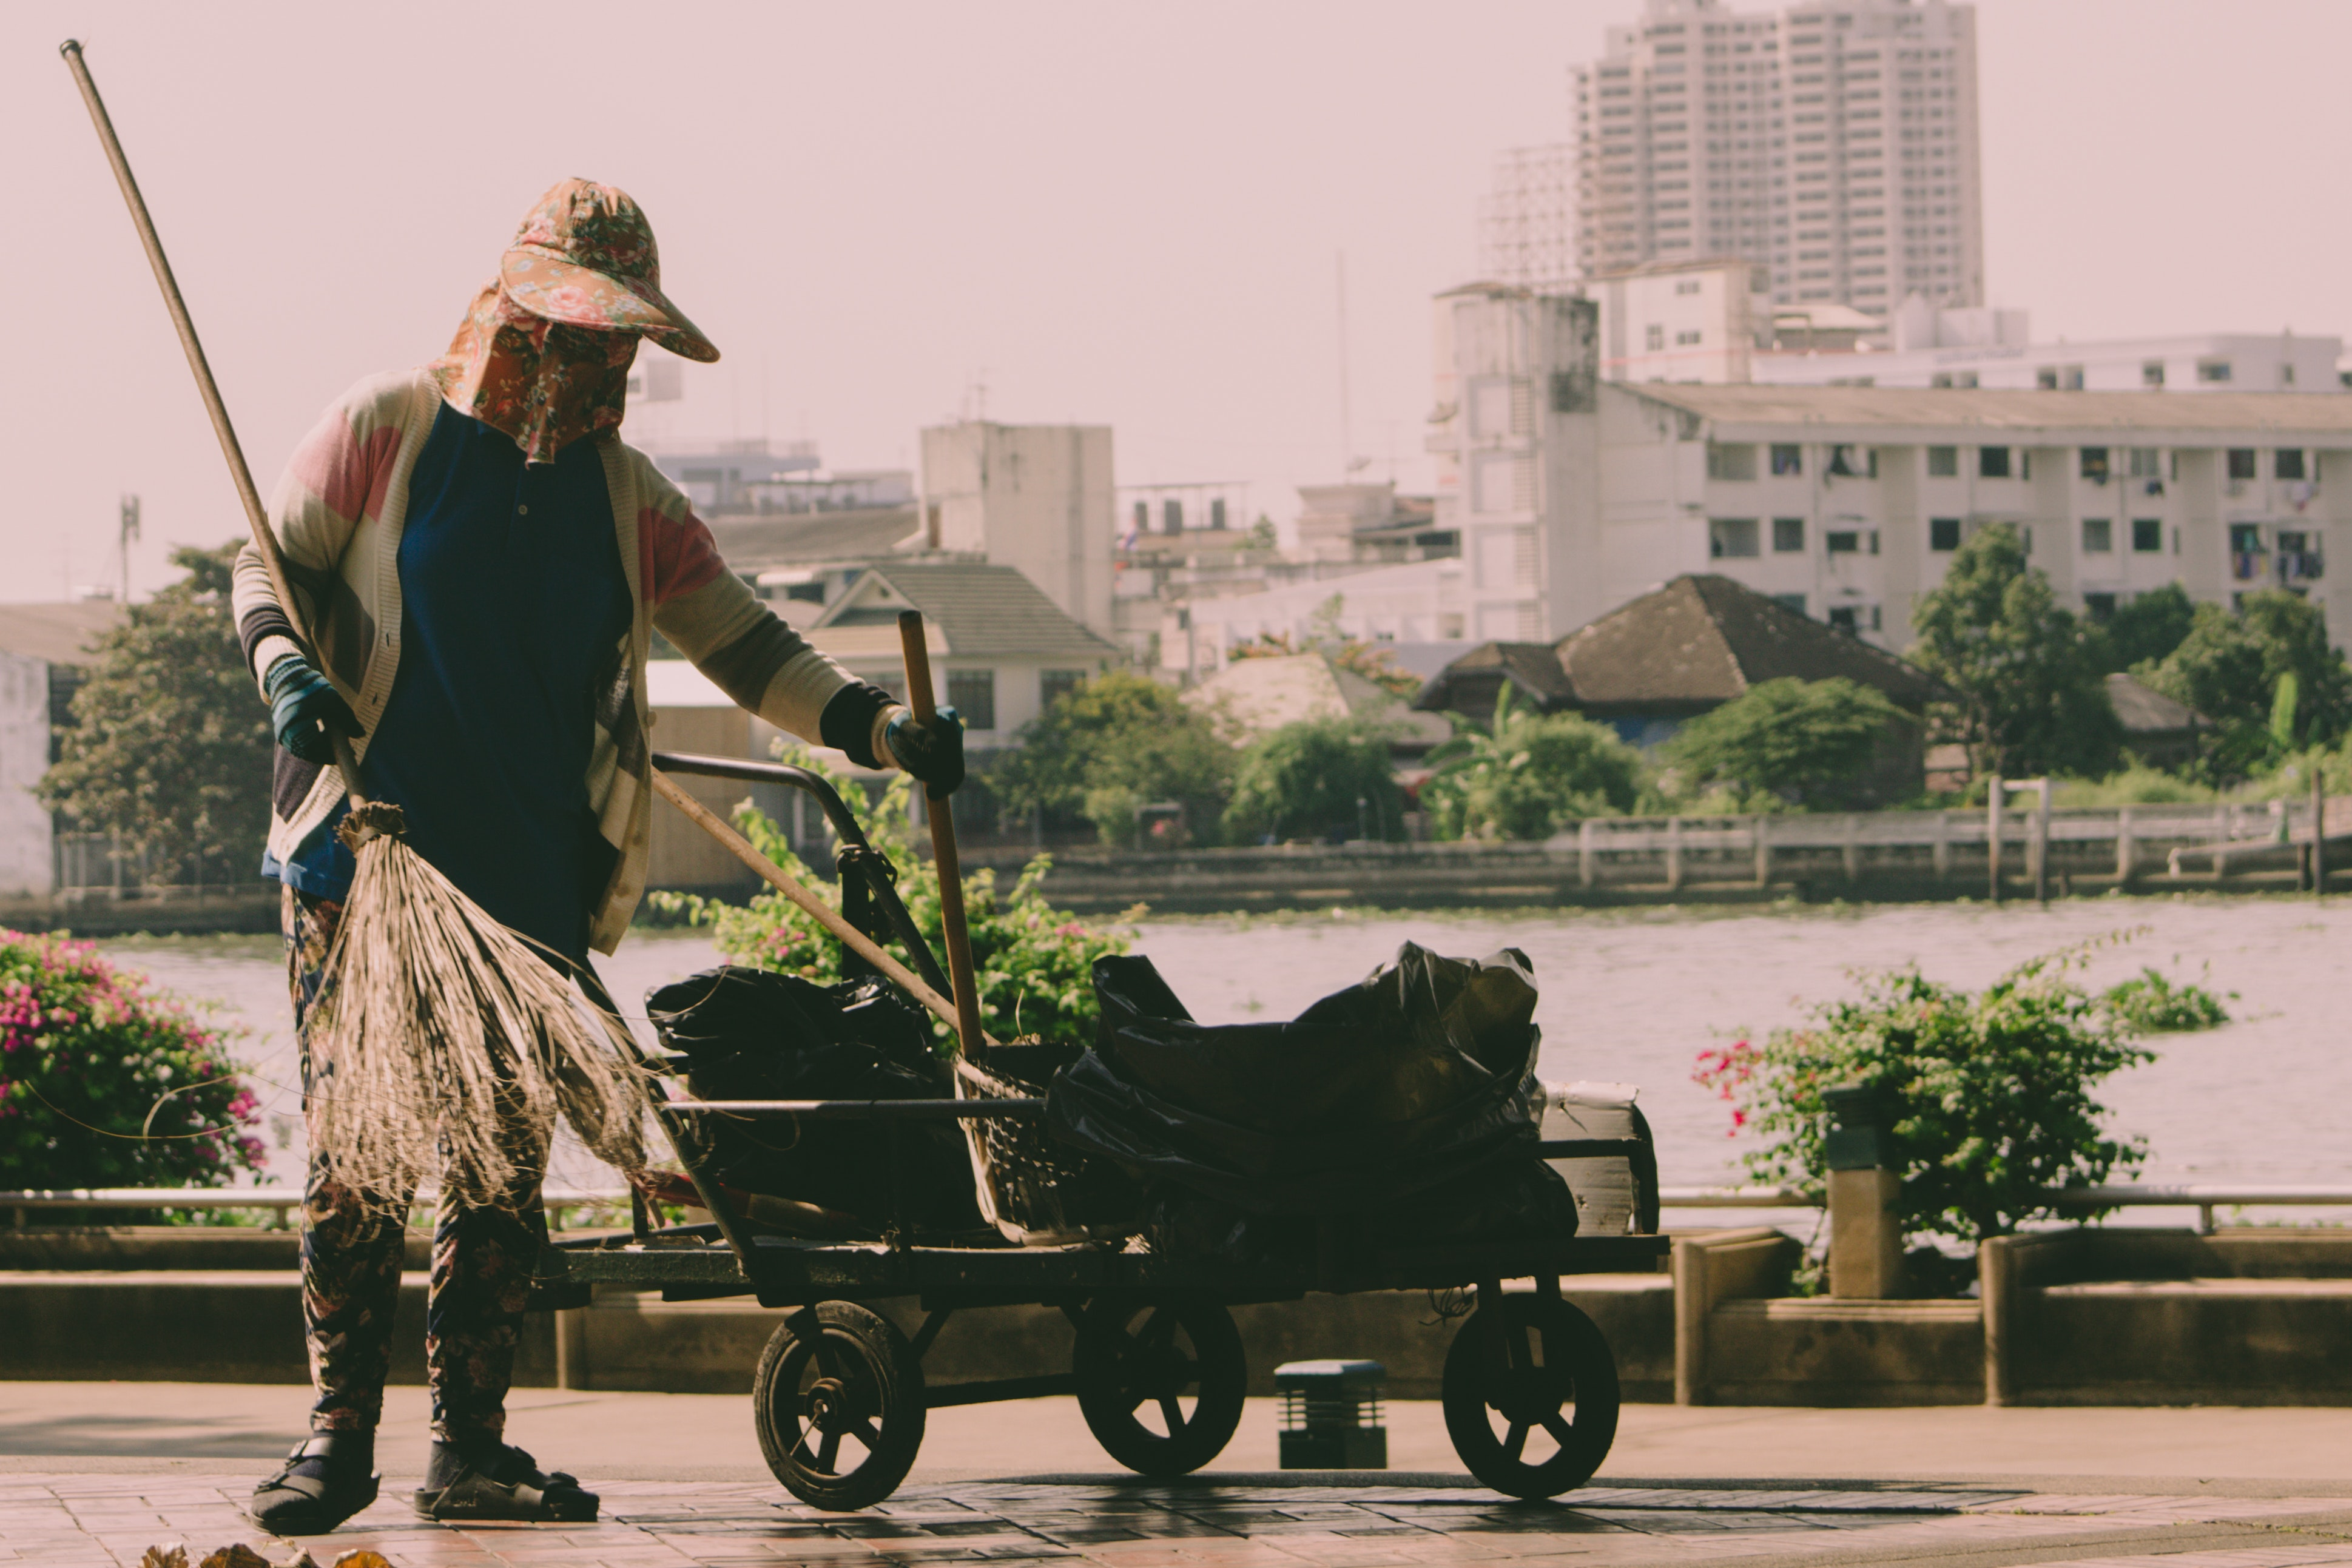 Woman sweeping on a patio. (Bas Masseus; 2008)